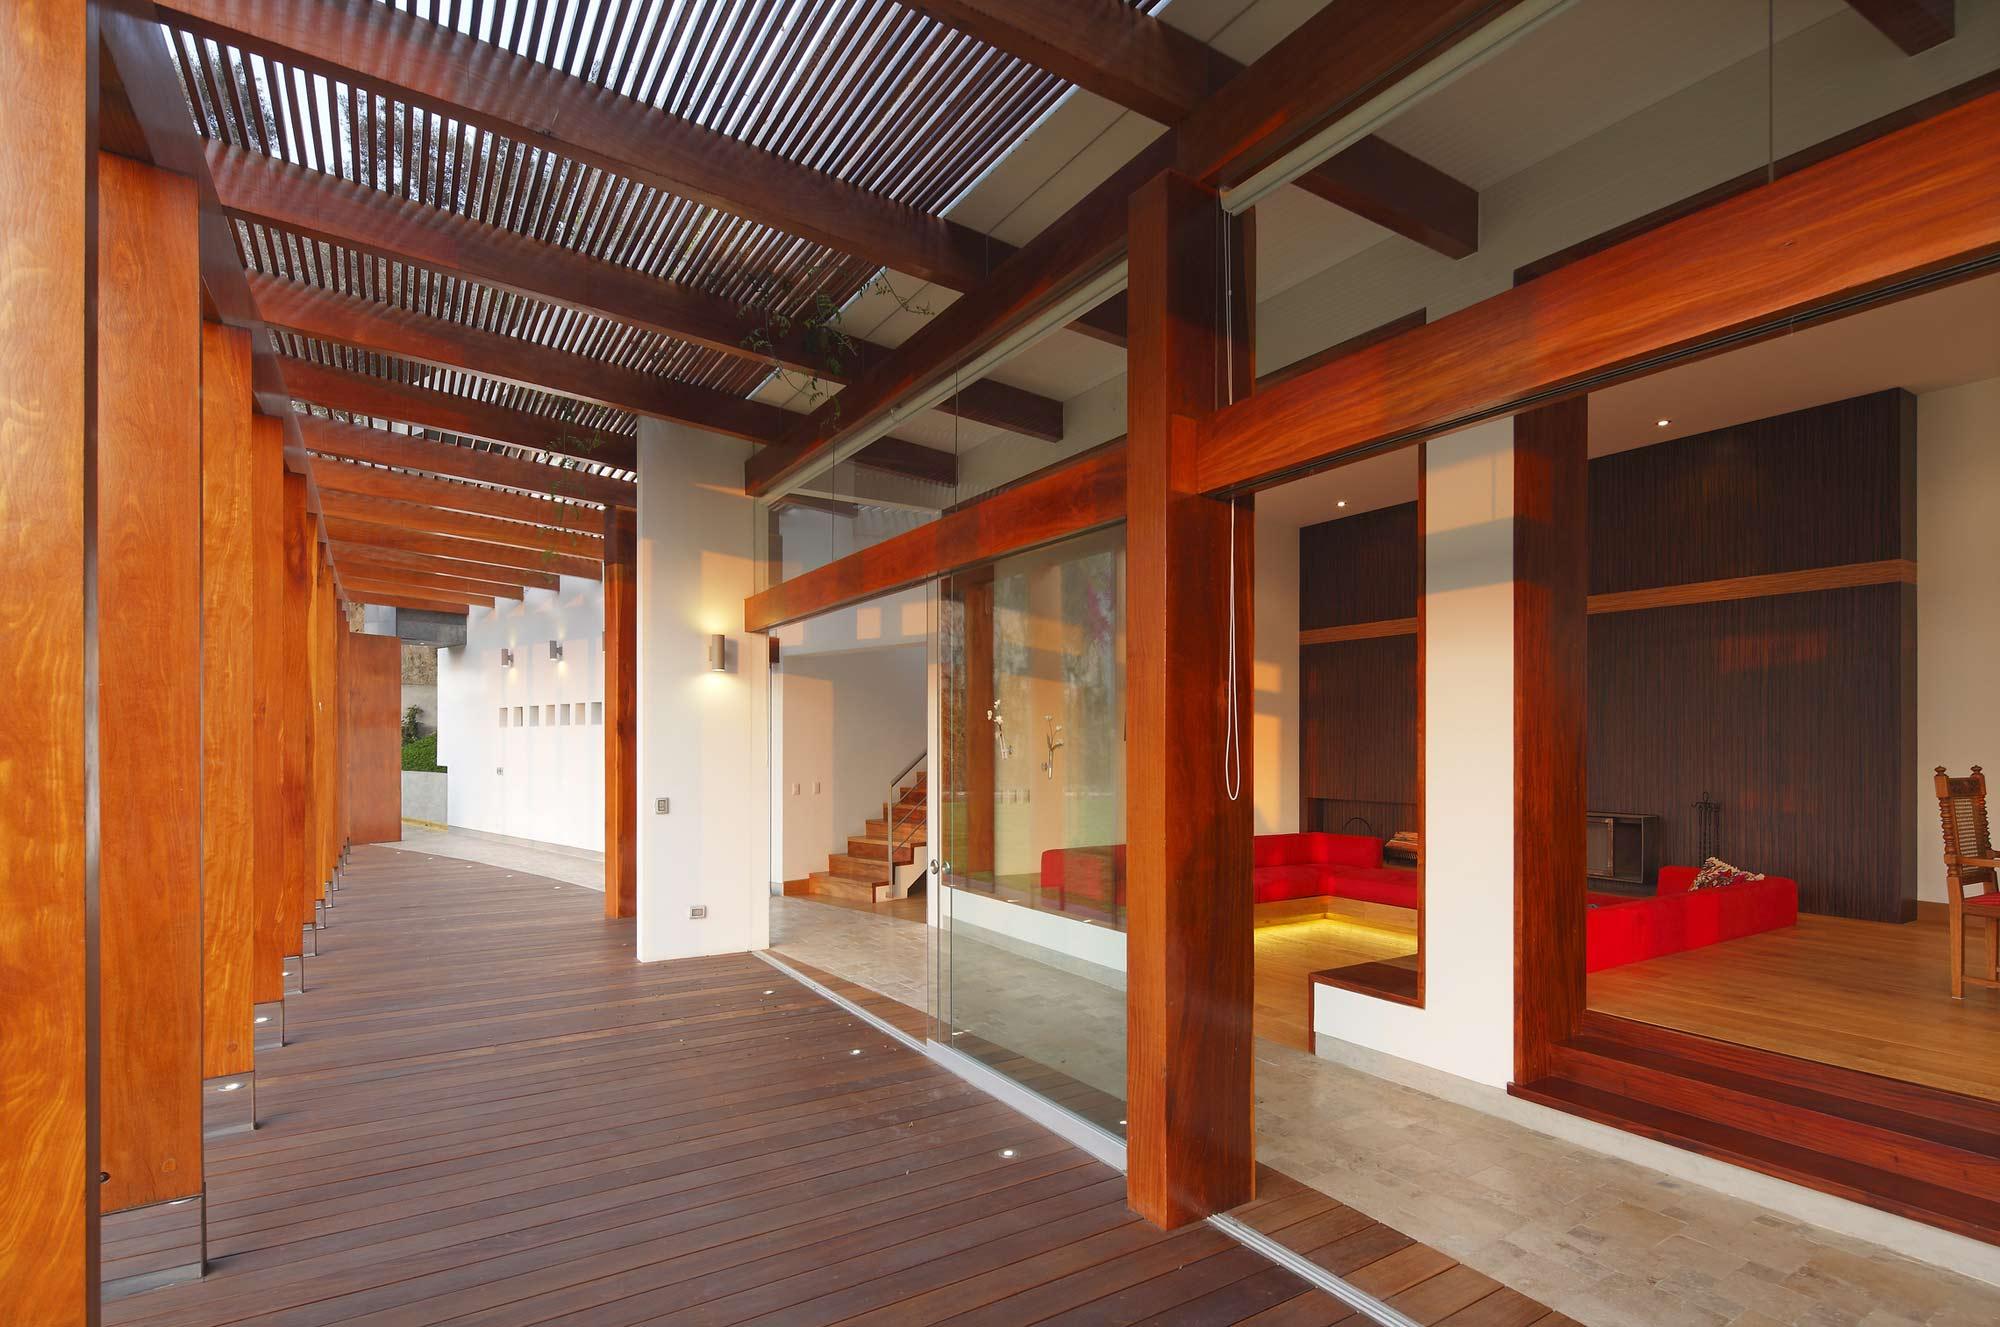 Terrace, Glass Doors, Summer Home in Lima, Peru